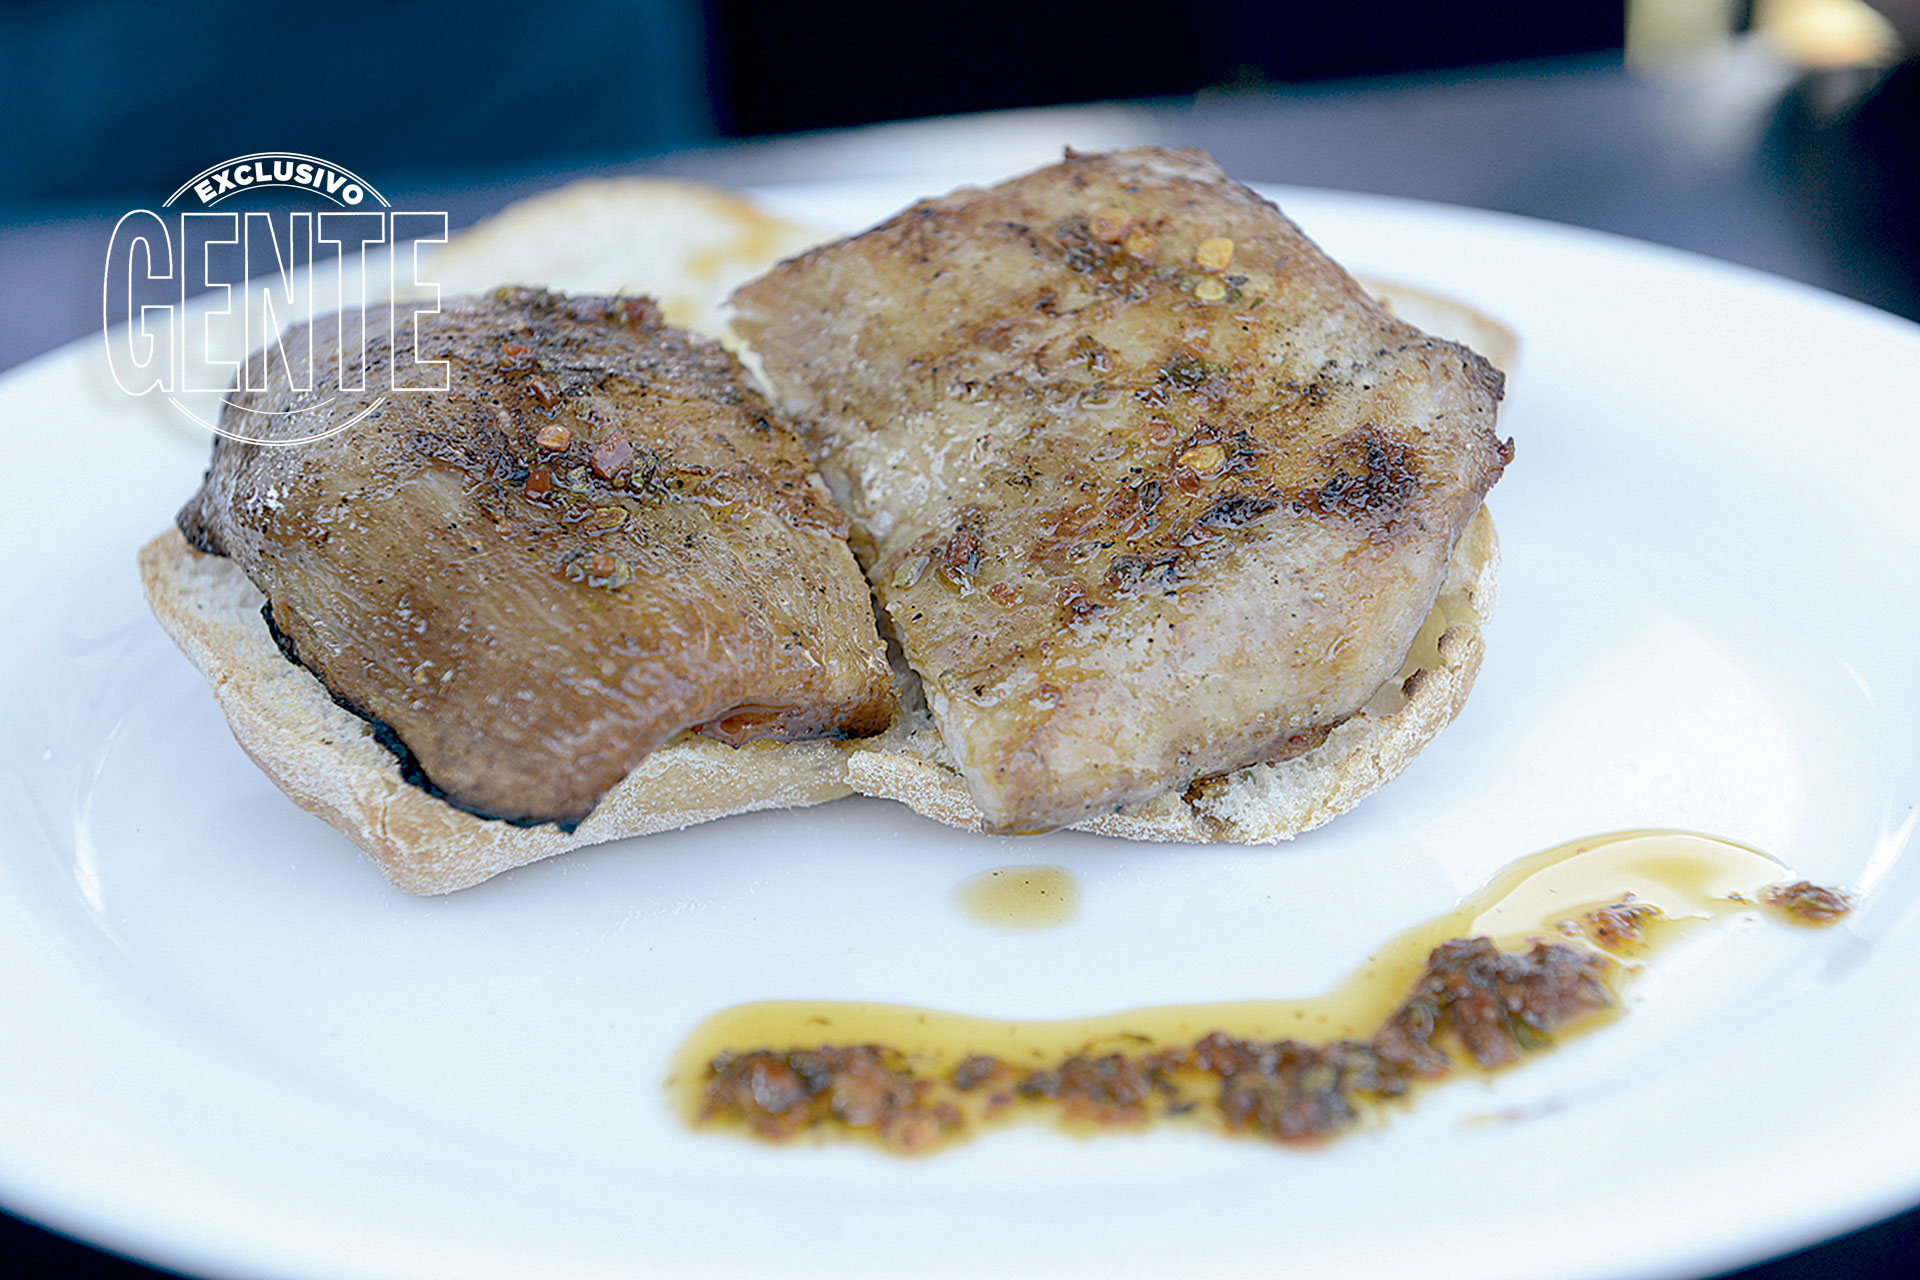 Restaurante Oviedo. Churrasquito de cerdo en ciabatta.